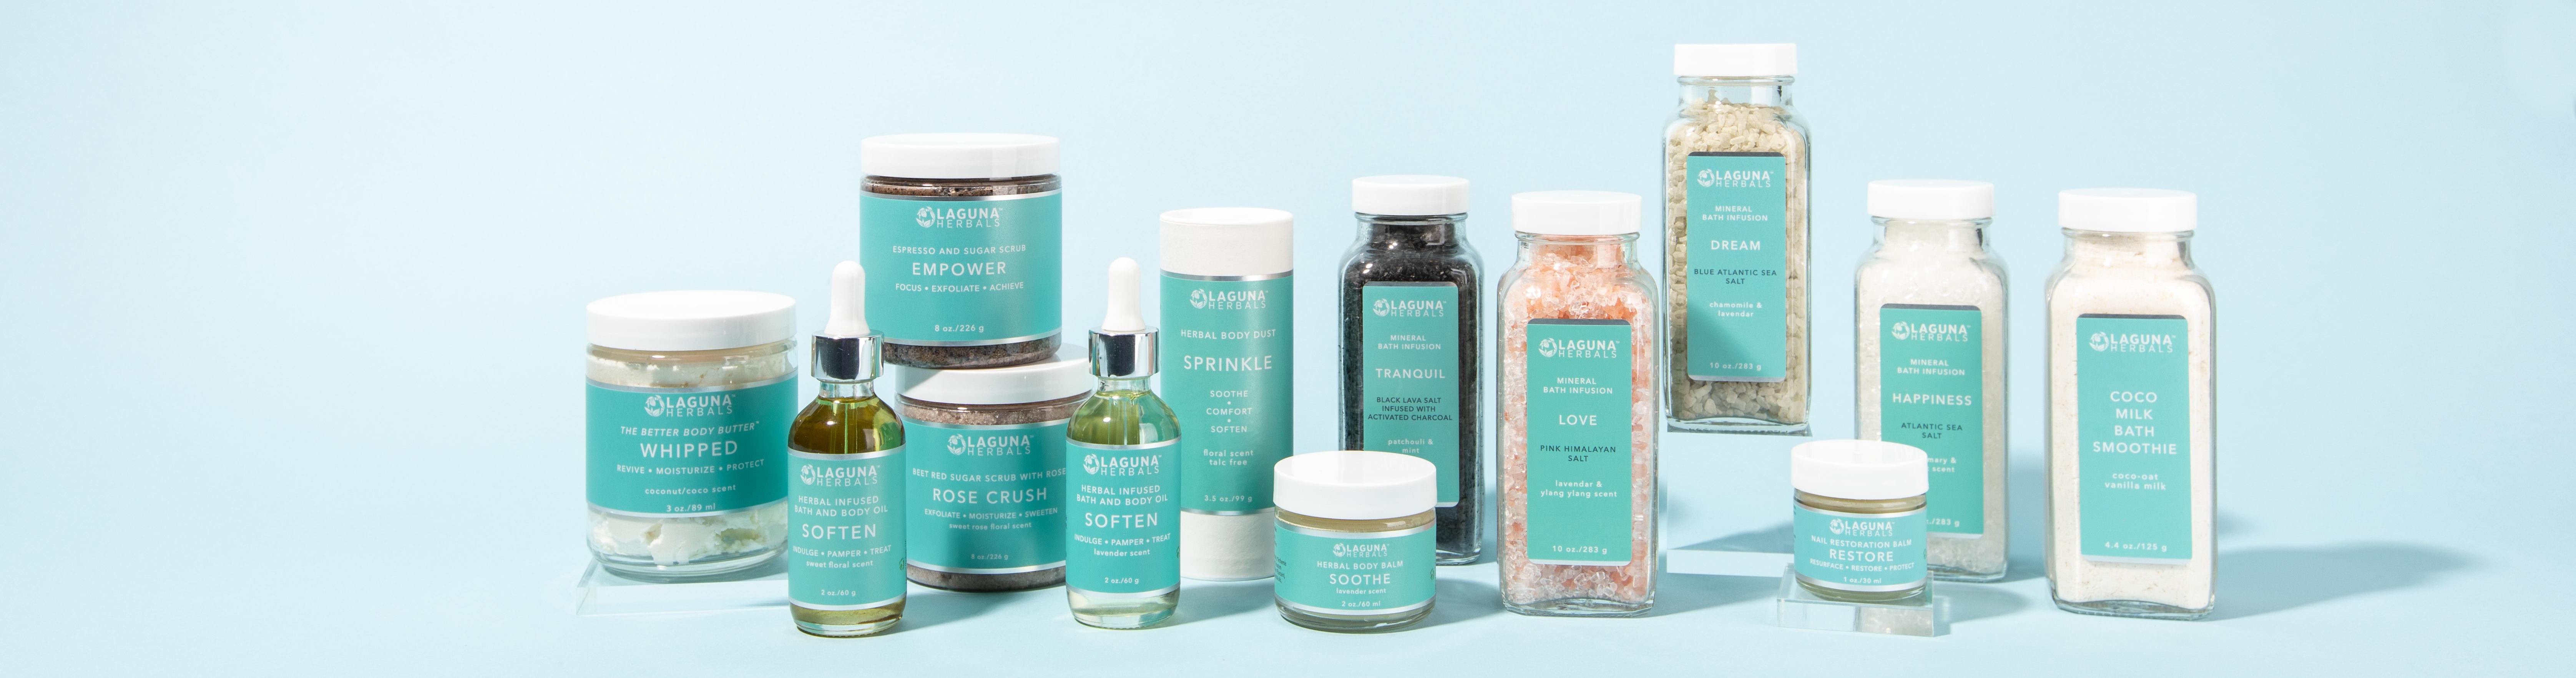 body scrub sunscreen cuticle oil talc-free powder jasmine rose lavender vaseline alternative moisturizer organic body lotion